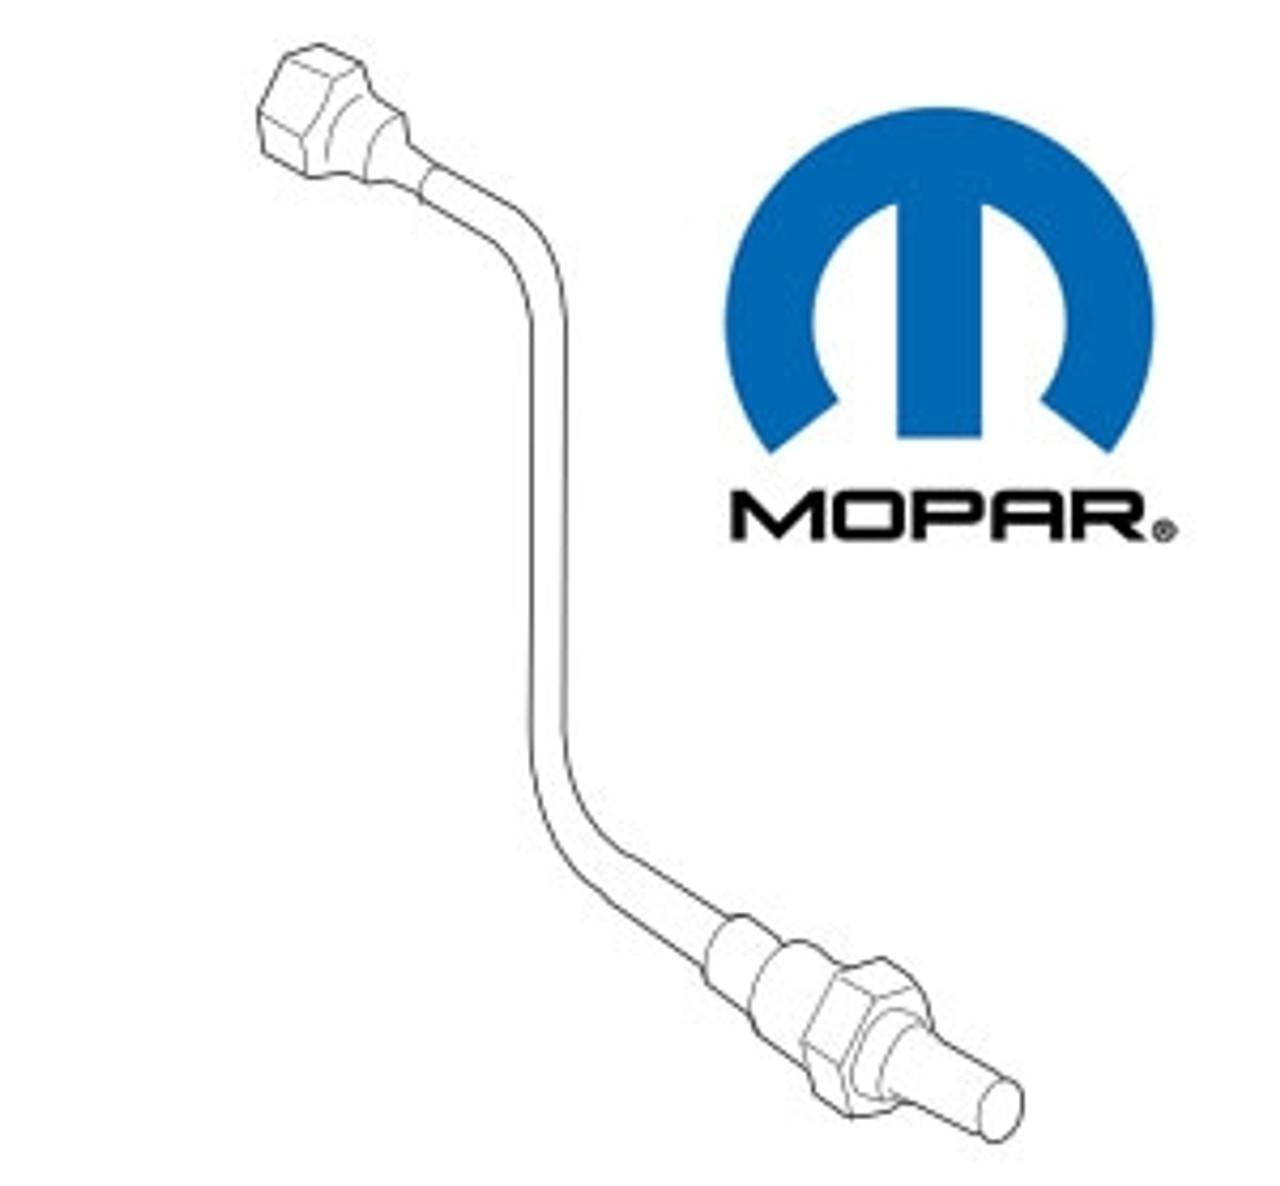 NEW OEM MOPAR O2 OXYGEN SENSOR MD345771 DOWNSTREAM 234-4641 MN122267